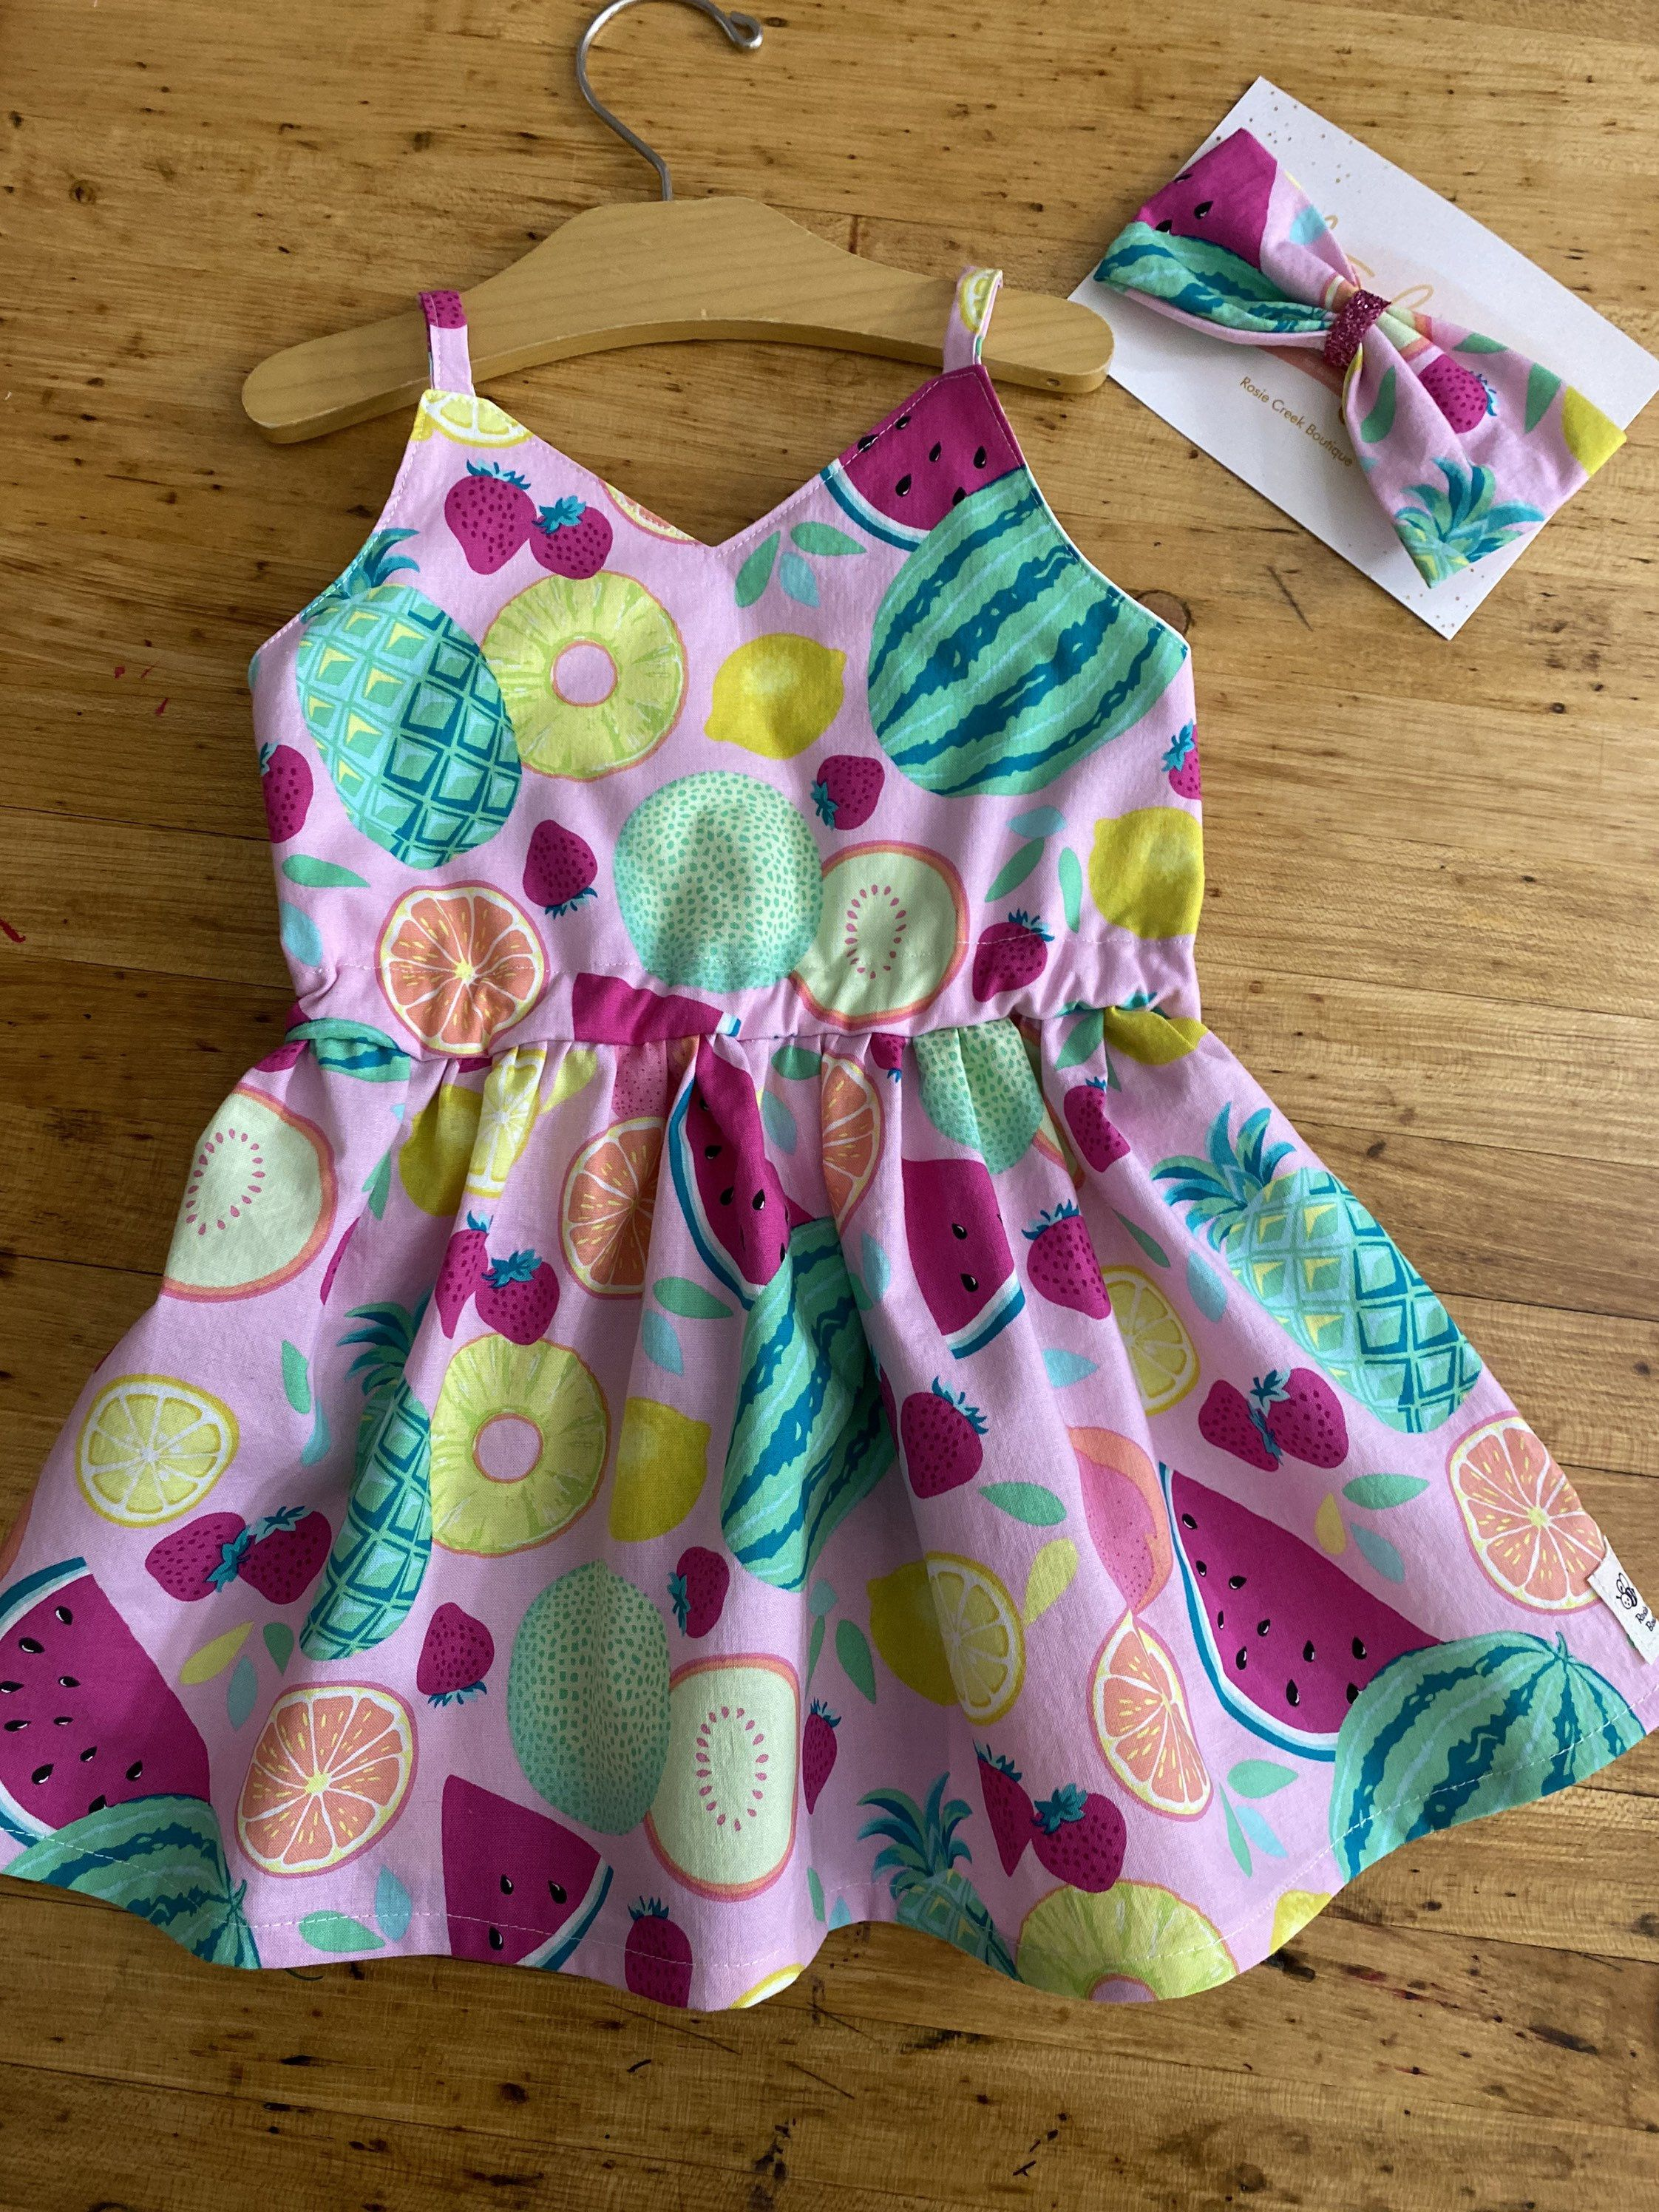 3t Summer Fruit Baby Toddler Summer Dress Retro Fruit Bright Etsy Toddler Girl Dresses Toddler Summer Dresses Toddler Summer [ 2992 x 2244 Pixel ]